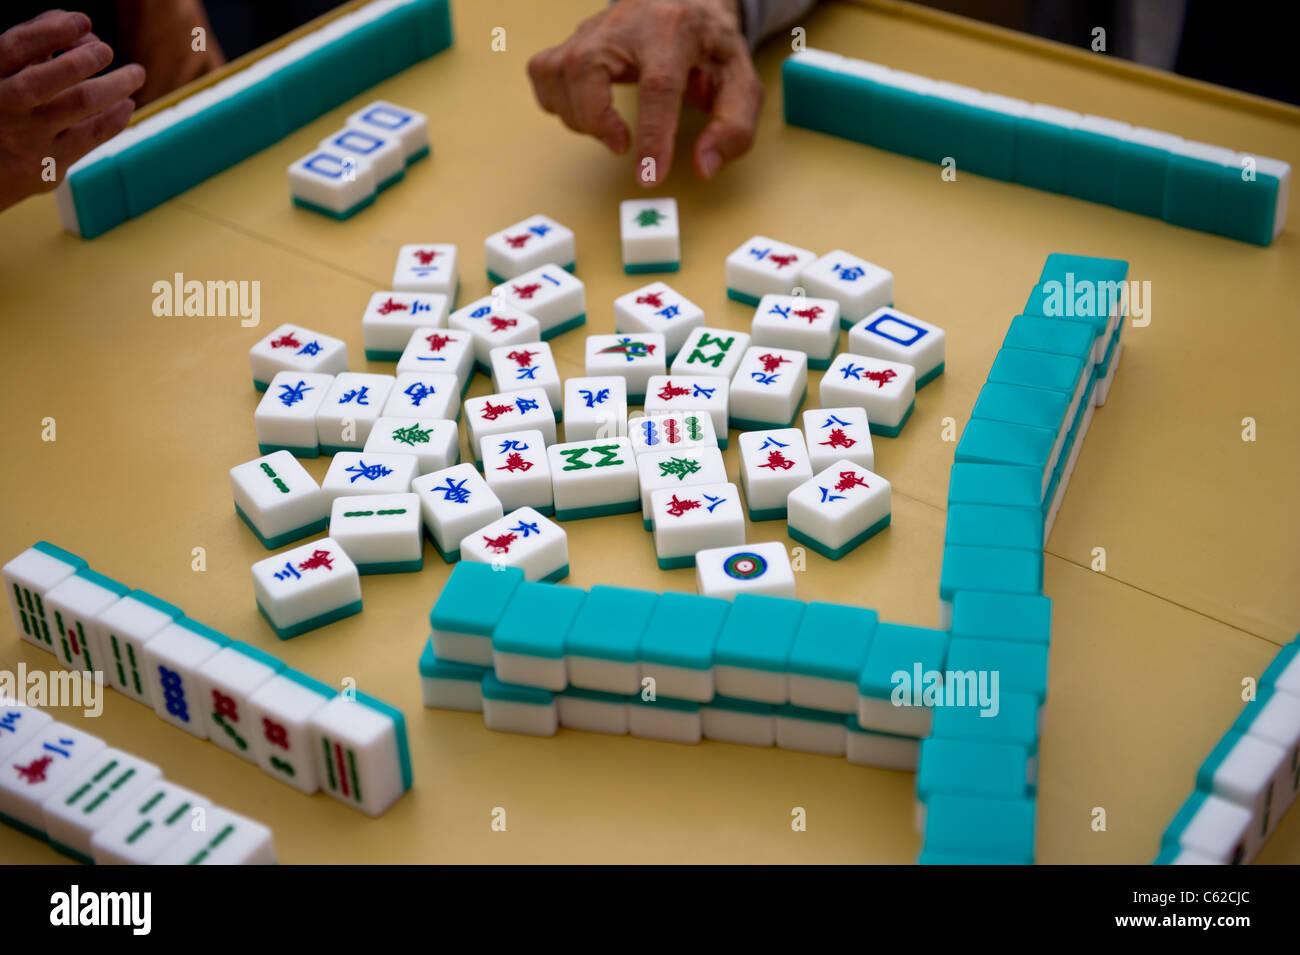 playing-mahjong-in-calgarys-chinatown-C62CJC.jpg